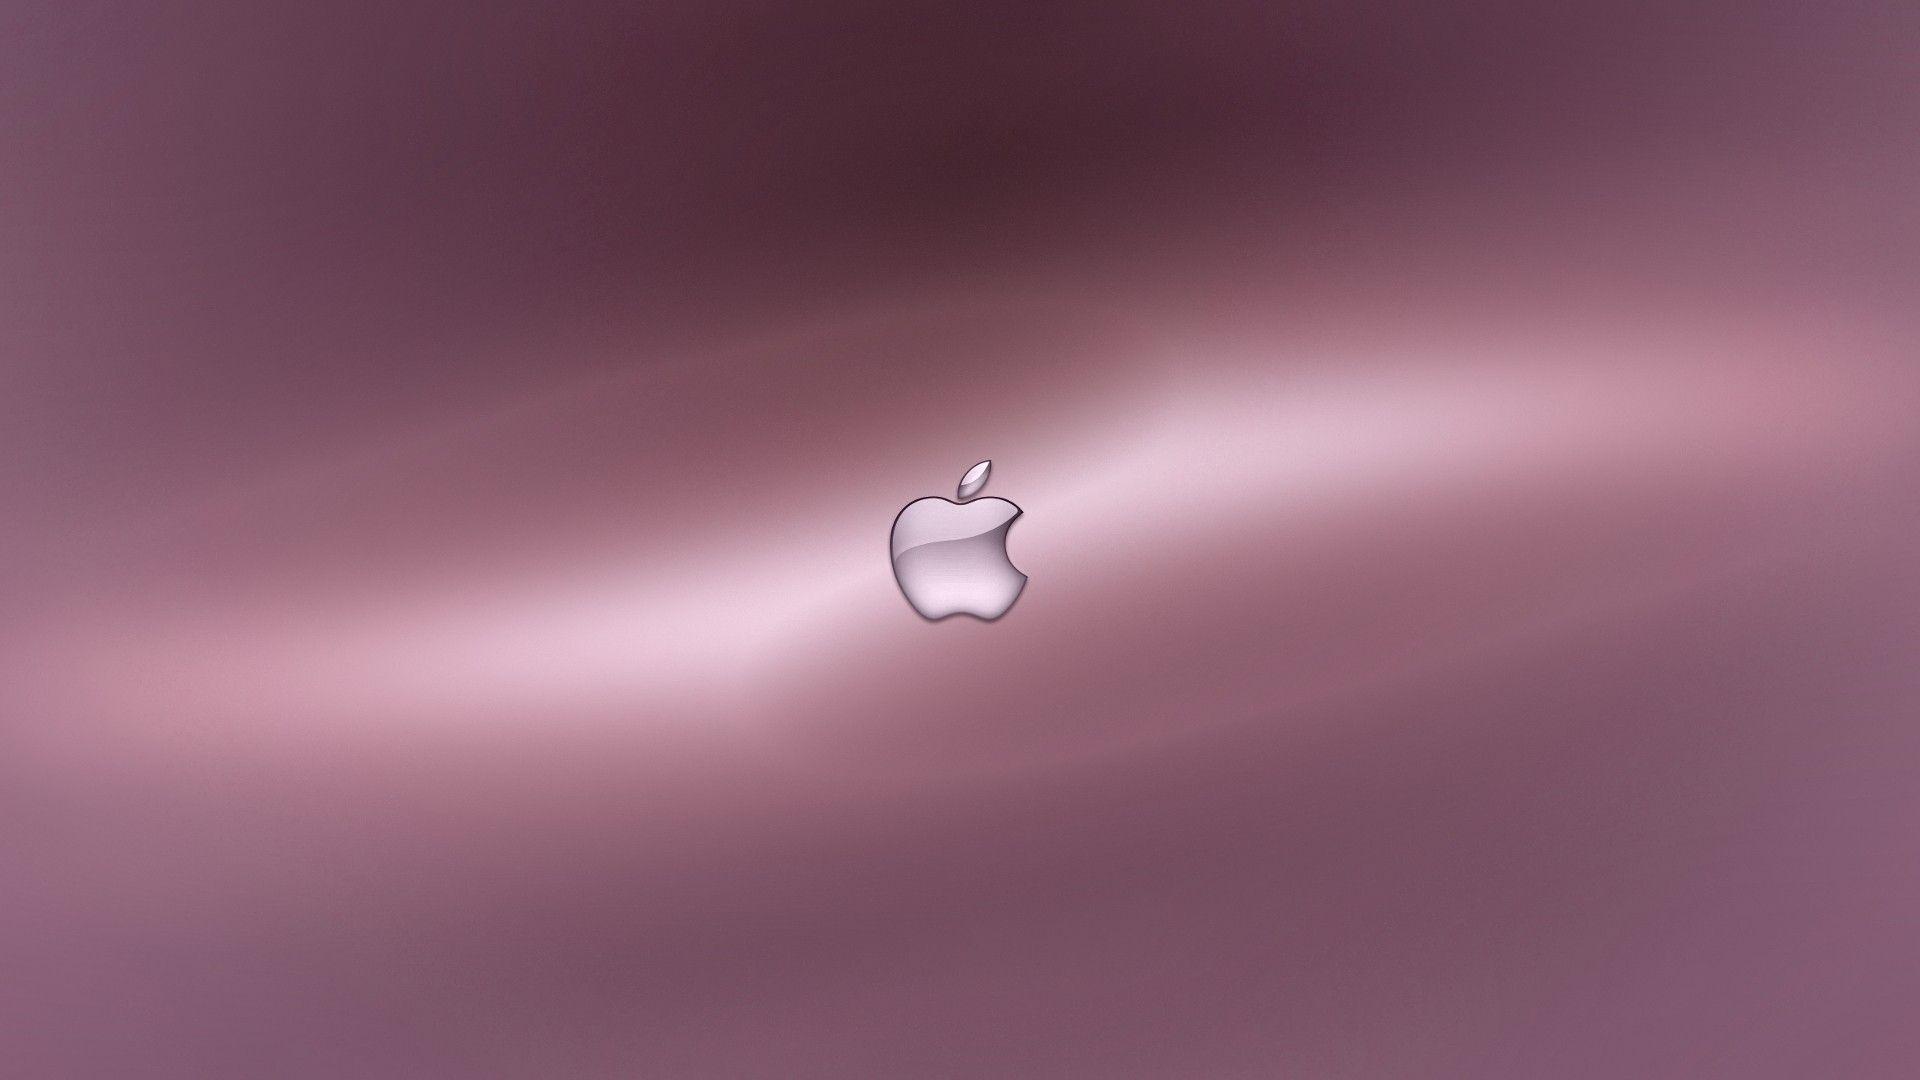 Amazing Wallpaper Macbook Purple - 291b700722a206bdcdcdd2927ccaf221  Image_96815.jpg